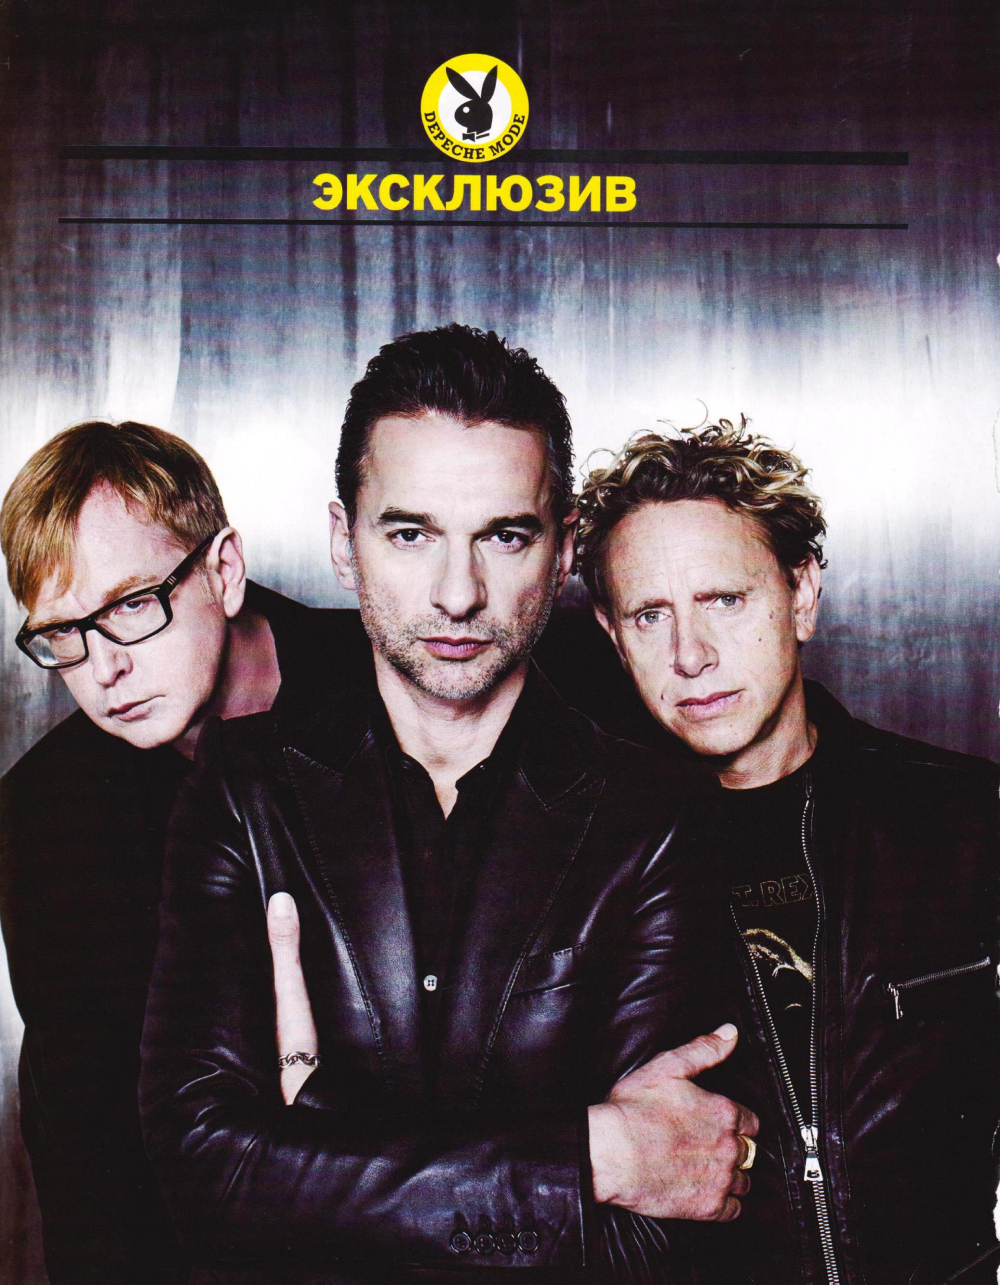 http://i2.imageban.ru/out/2013/12/29/14a86553a9cbf2fb84f6257bccca7dba.jpg